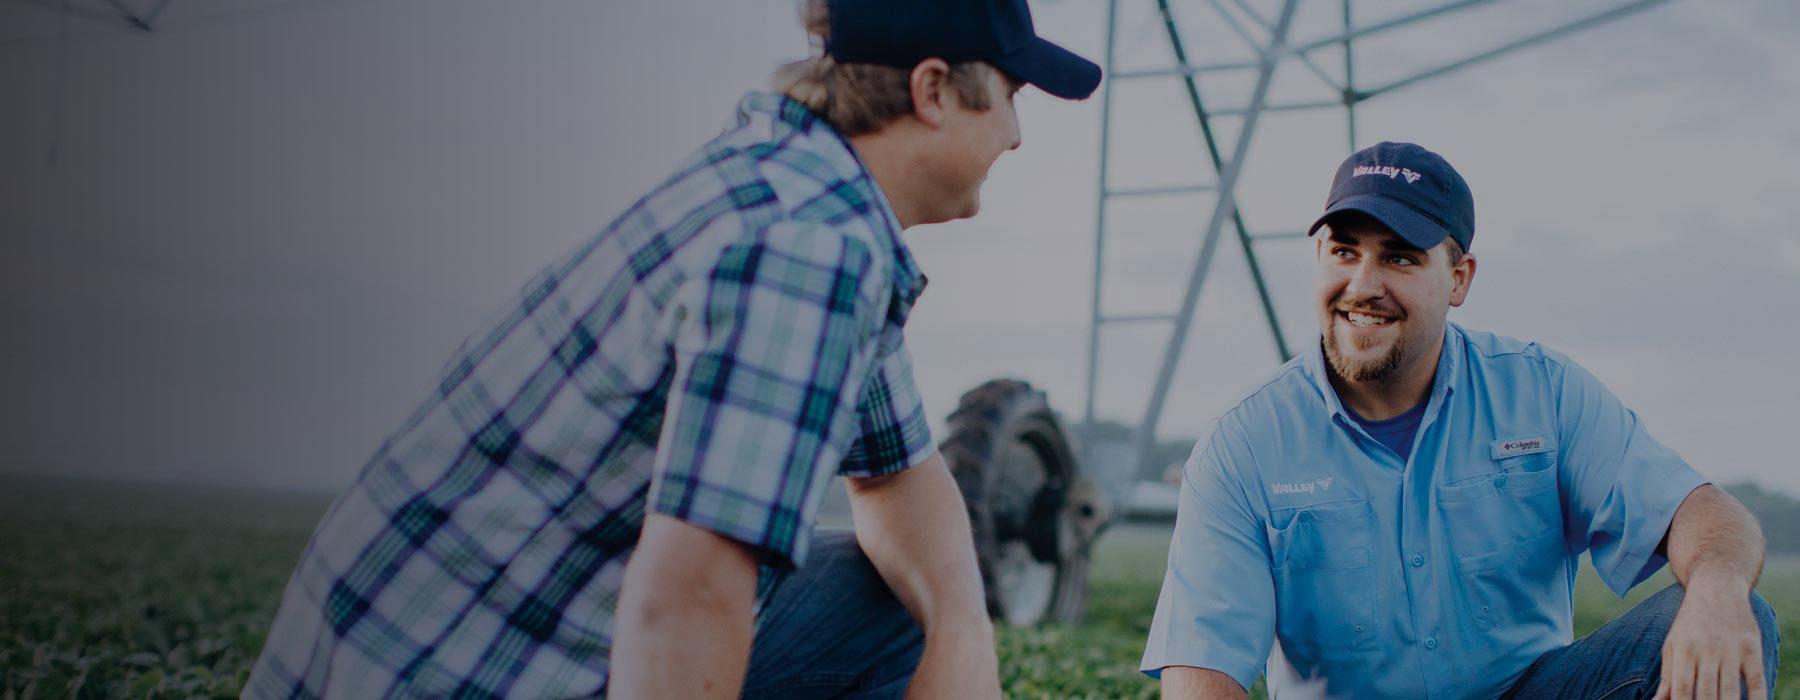 valley dealers - center pivot irrigation dealers